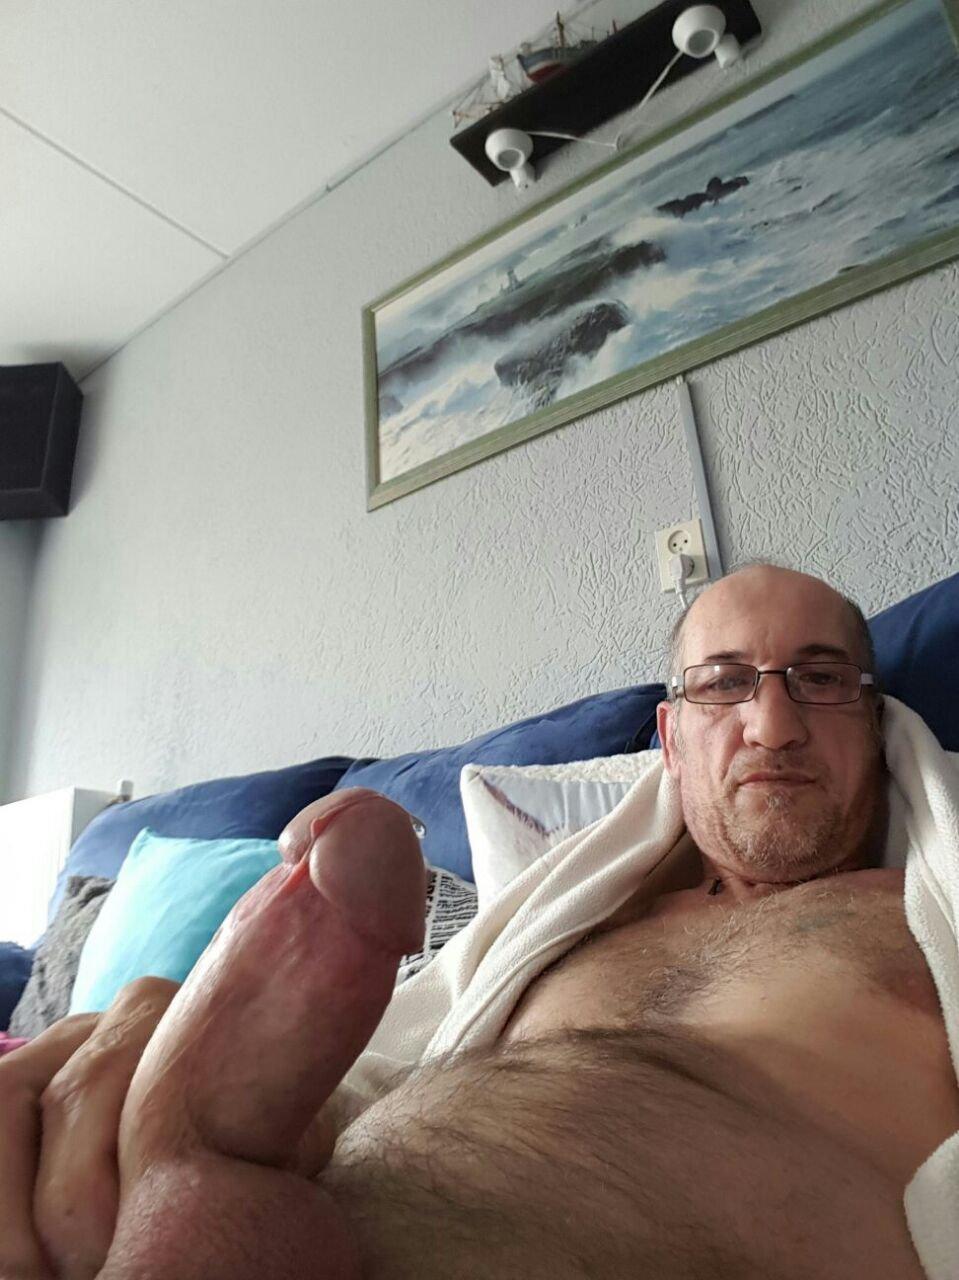 juan uit Noord-Holland,Nederland